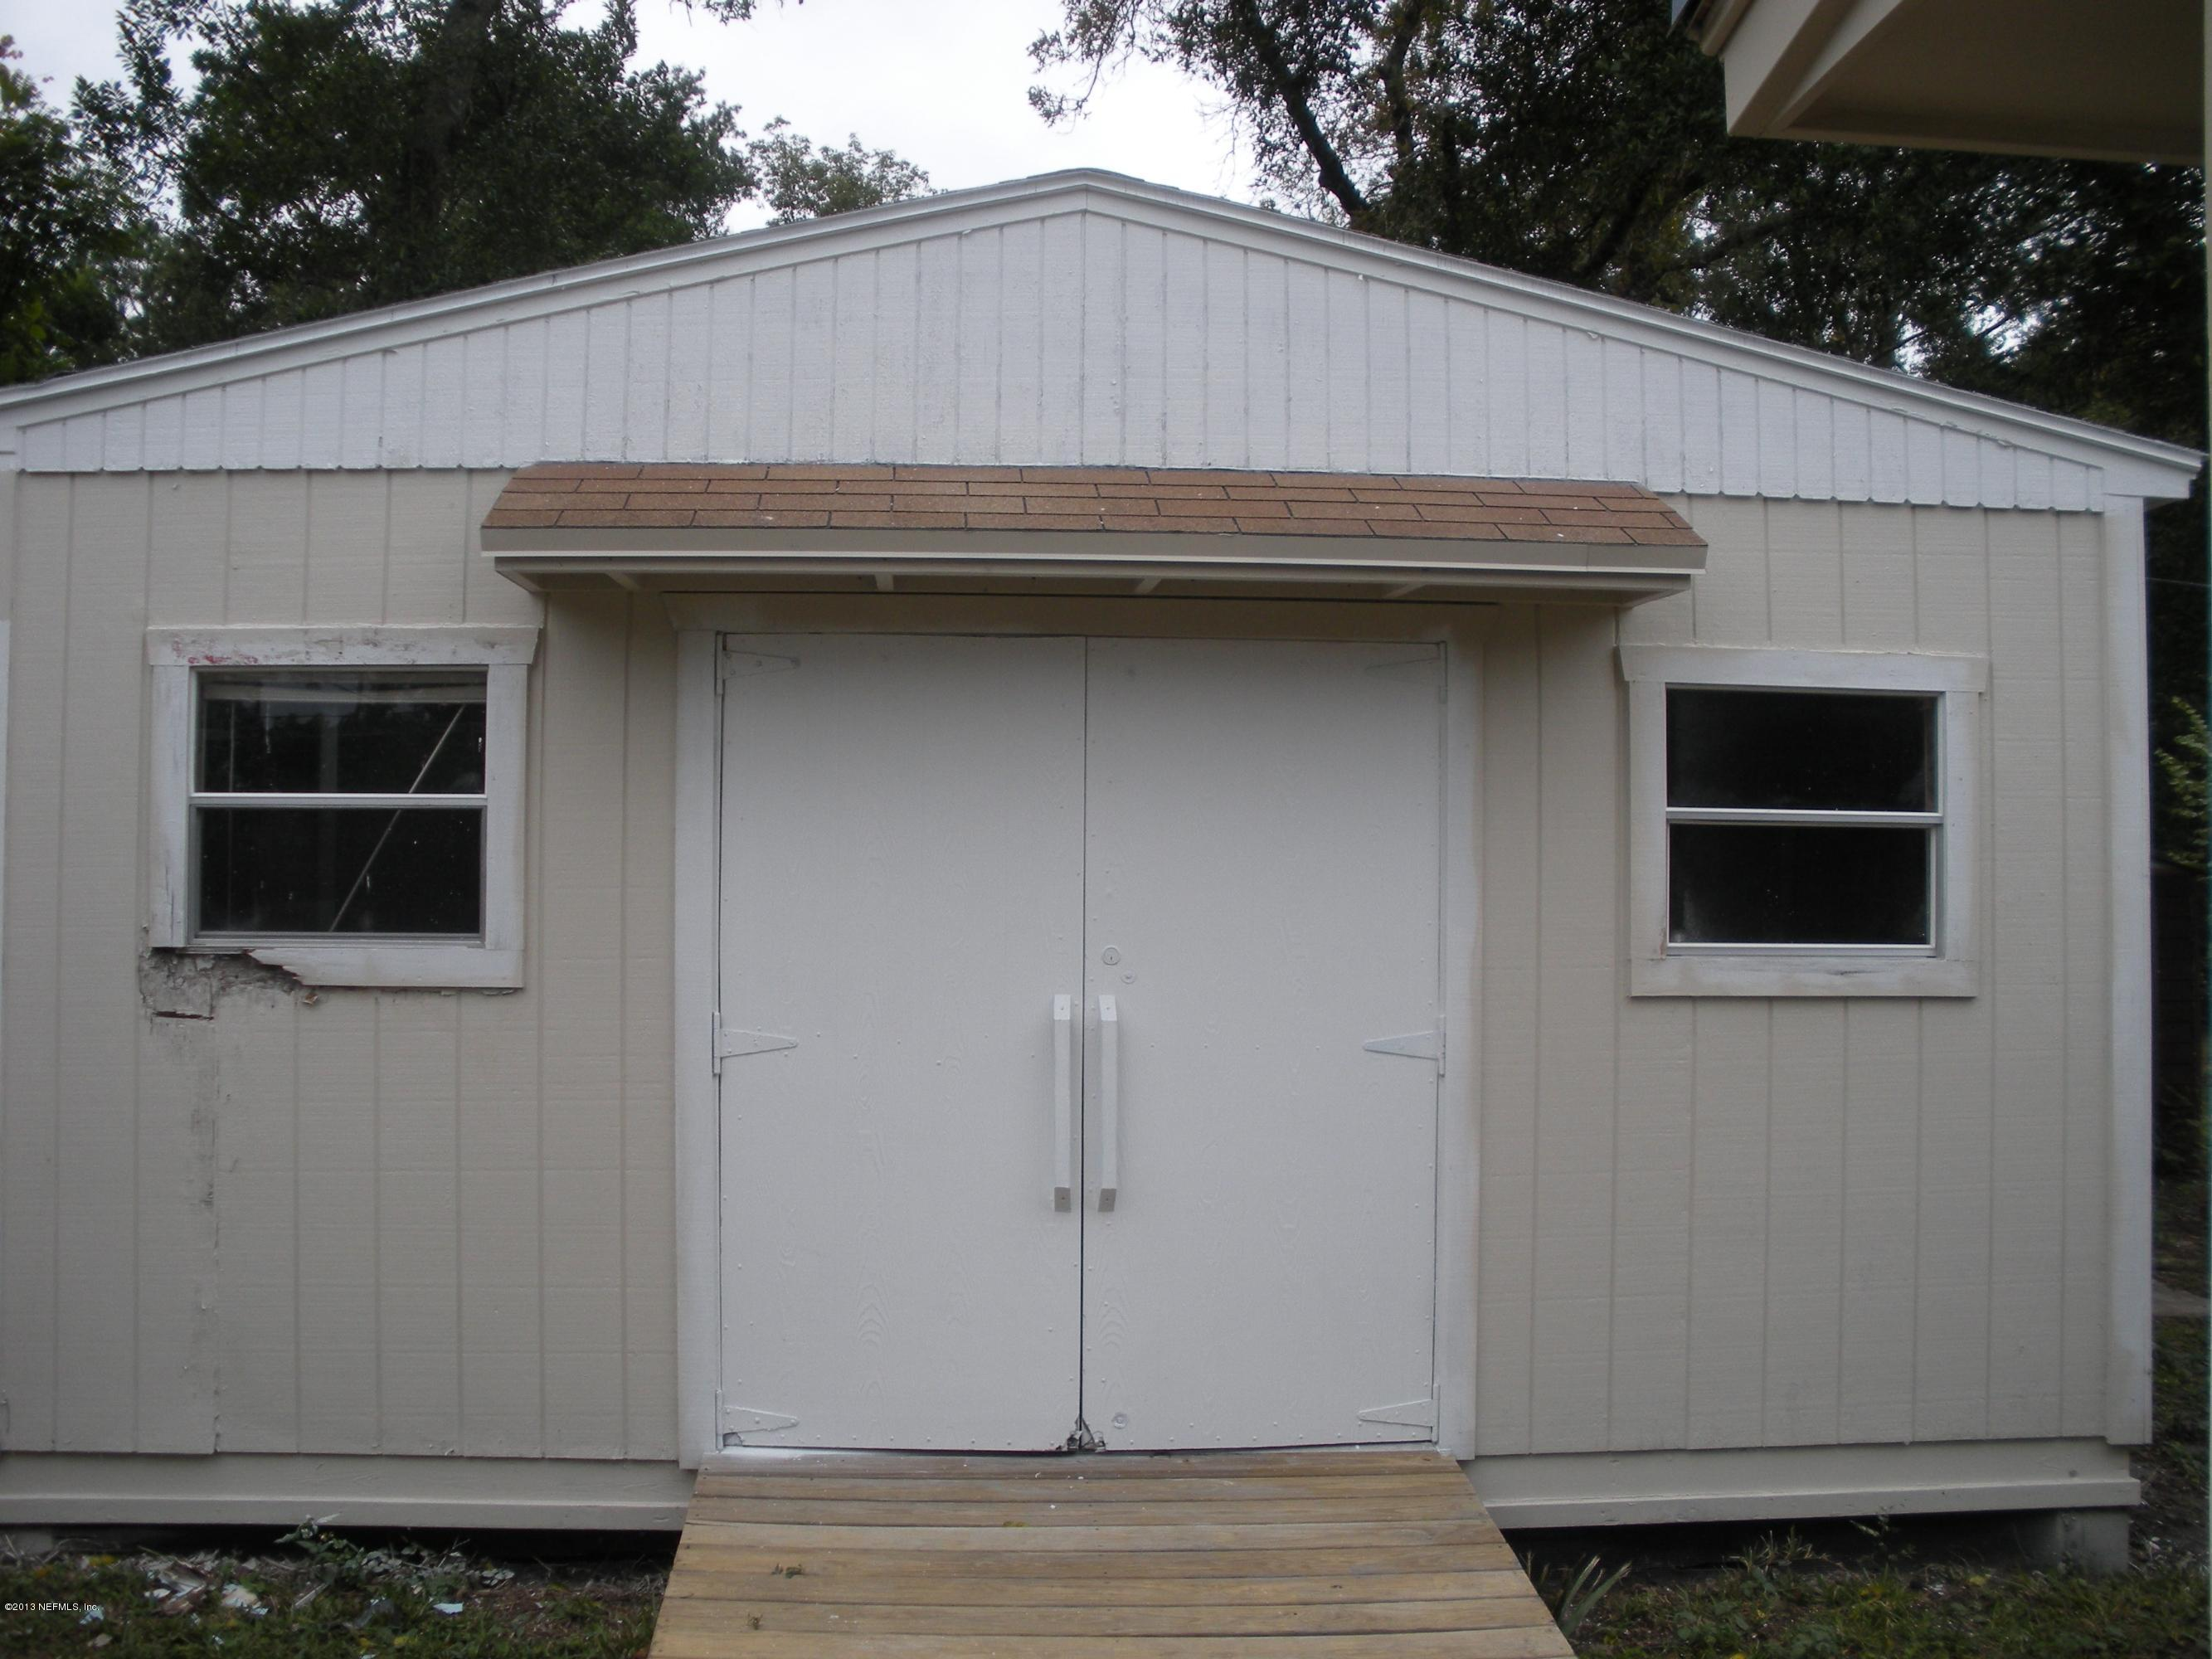 3652 PEACH, JACKSONVILLE, FLORIDA 32246, 2 Bedrooms Bedrooms, ,1 BathroomBathrooms,Rental,For Rent,PEACH,1080747